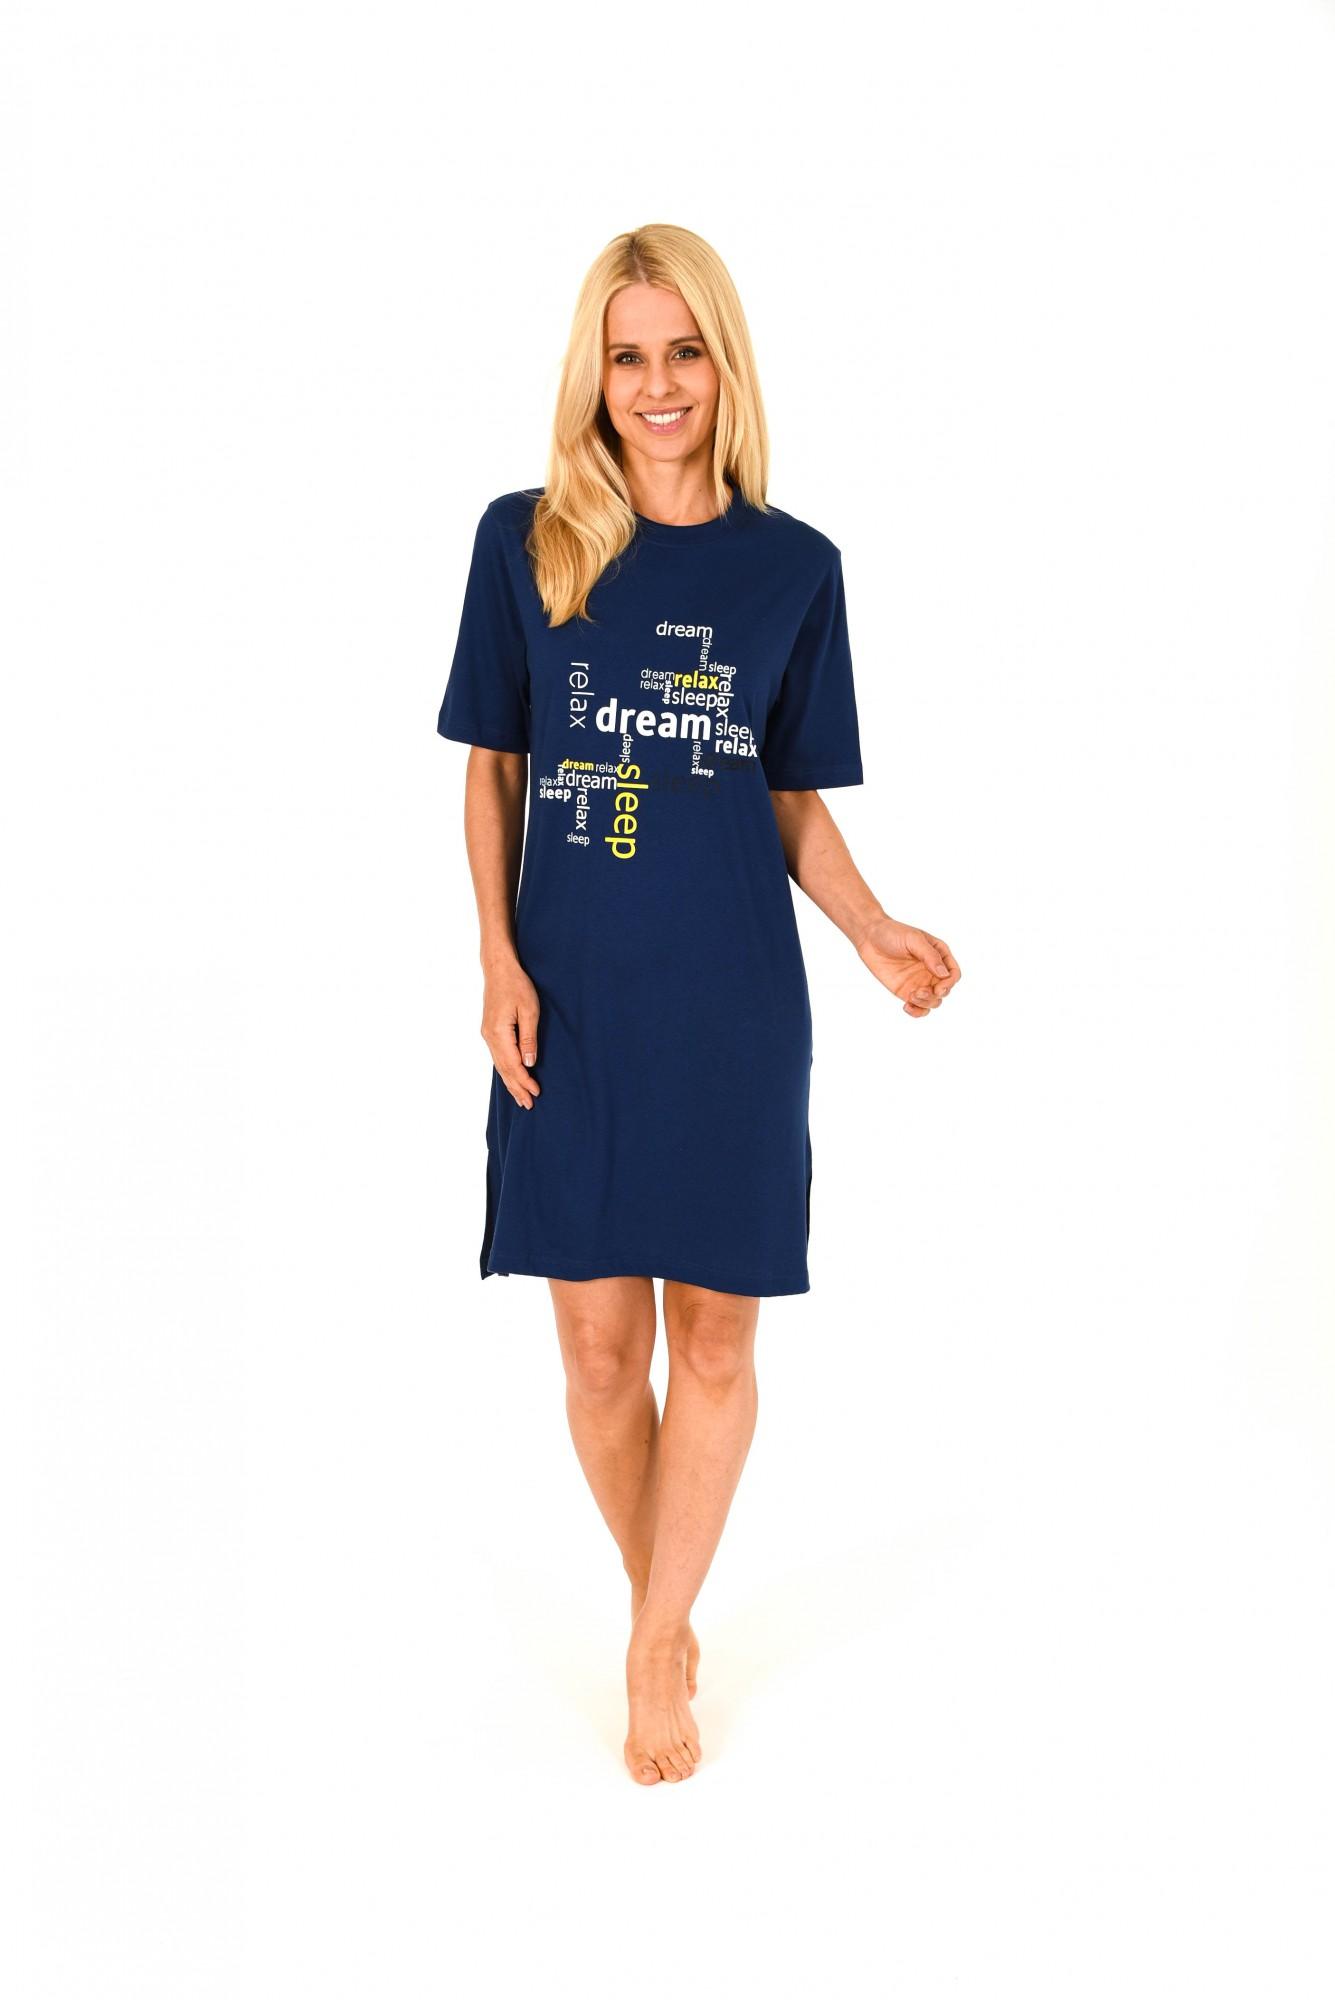 Damen Bigshirt kurzarm Nachthemd mit Frontprint – 171 213 90 828 001